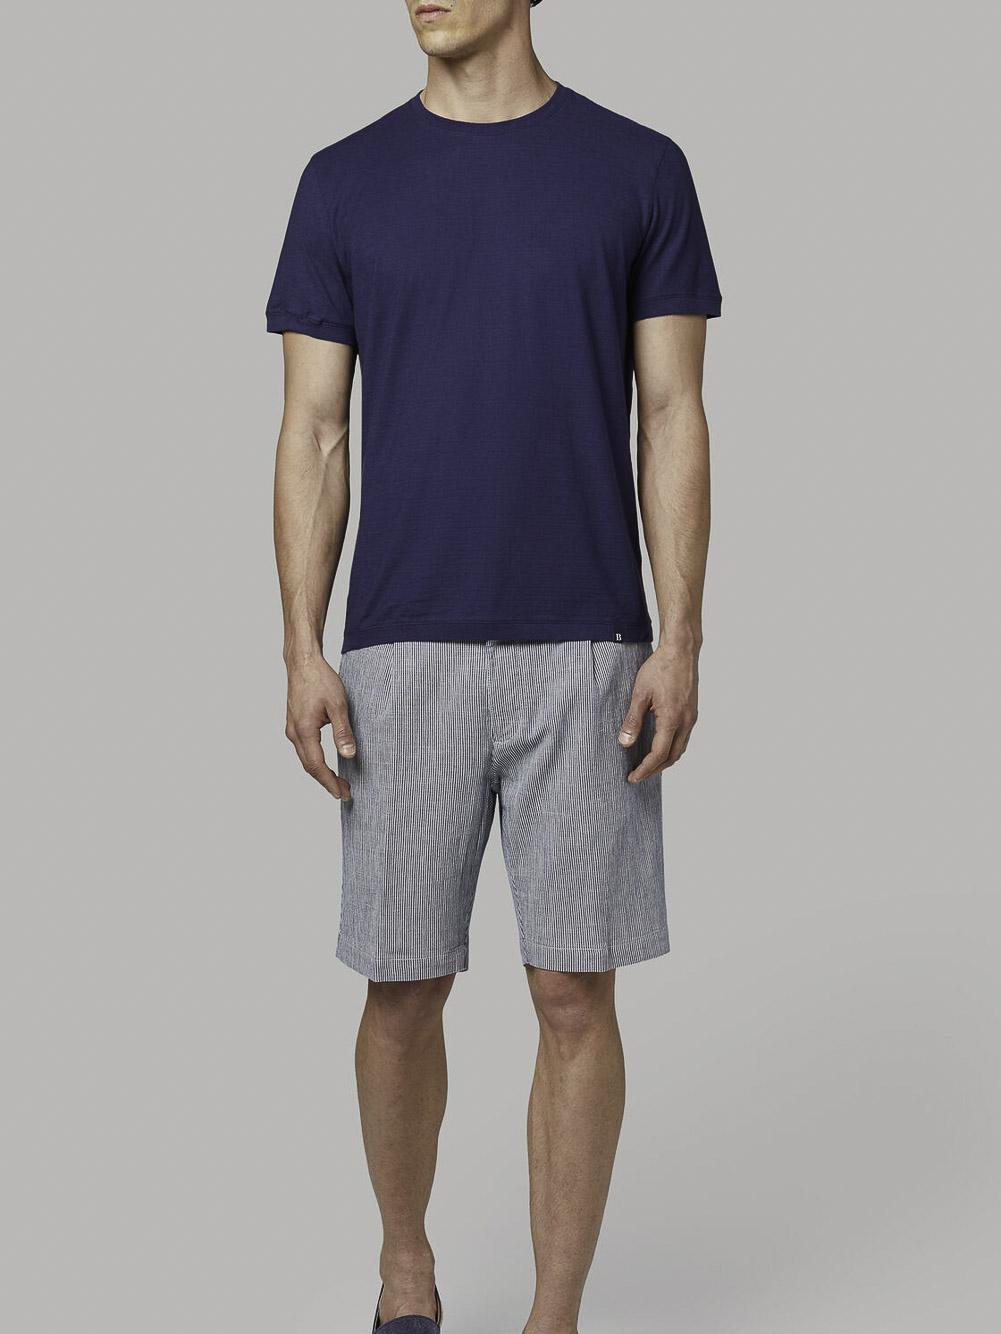 BOGGI Μπλούζα Τ-shirt B021P022702 ΜΠΛΕ